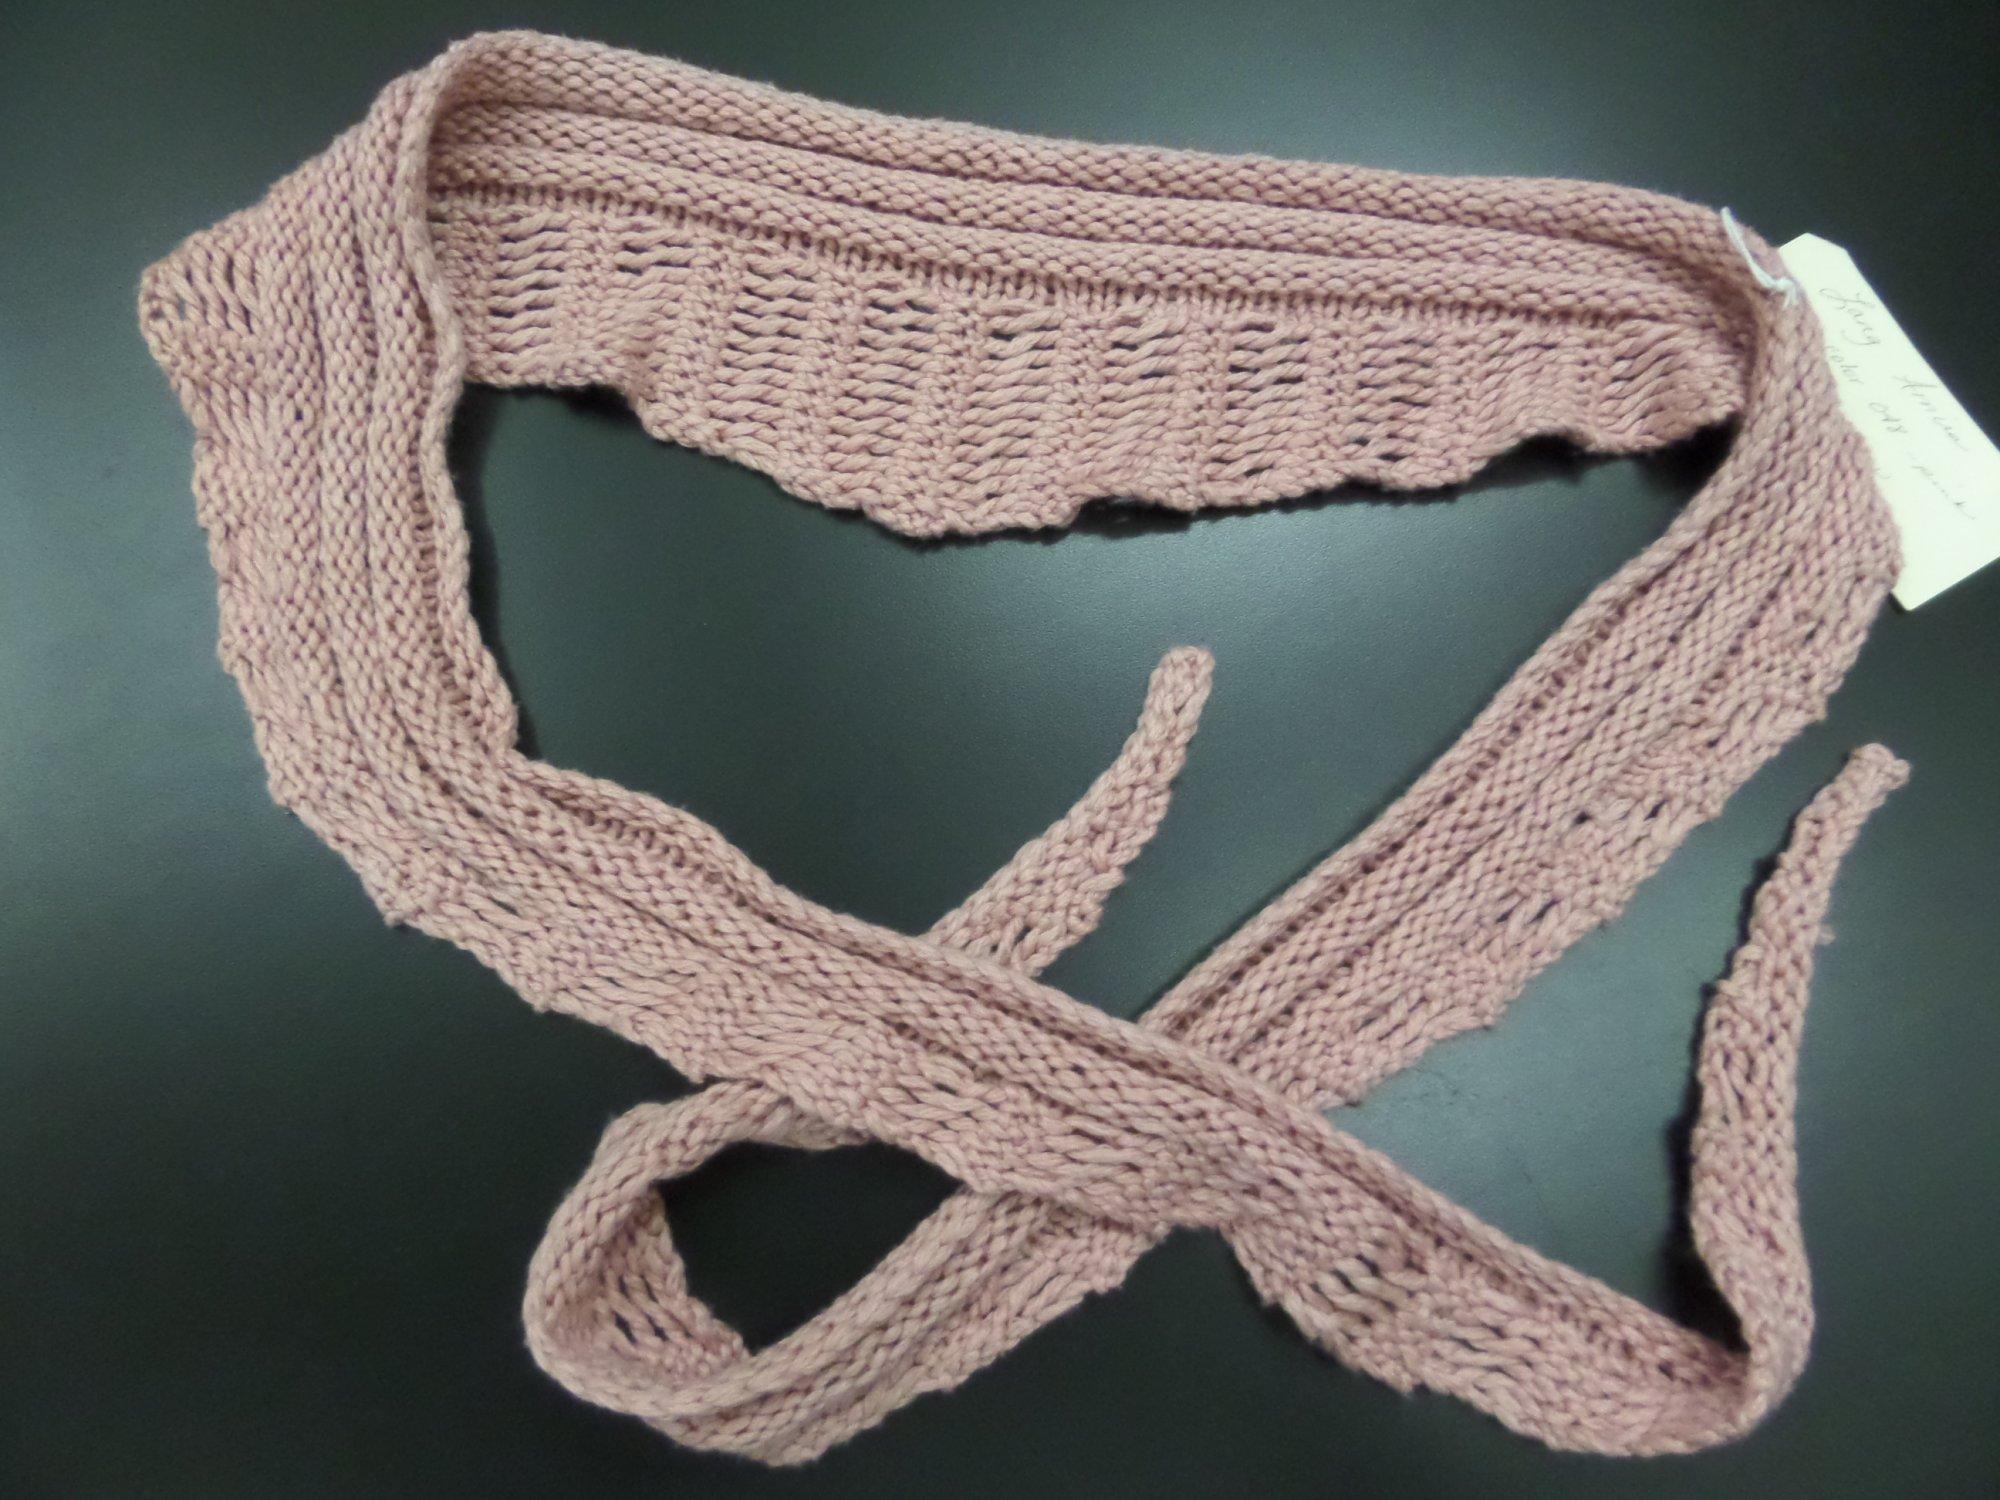 Gallatin scarf model in Amira yarn from Lang